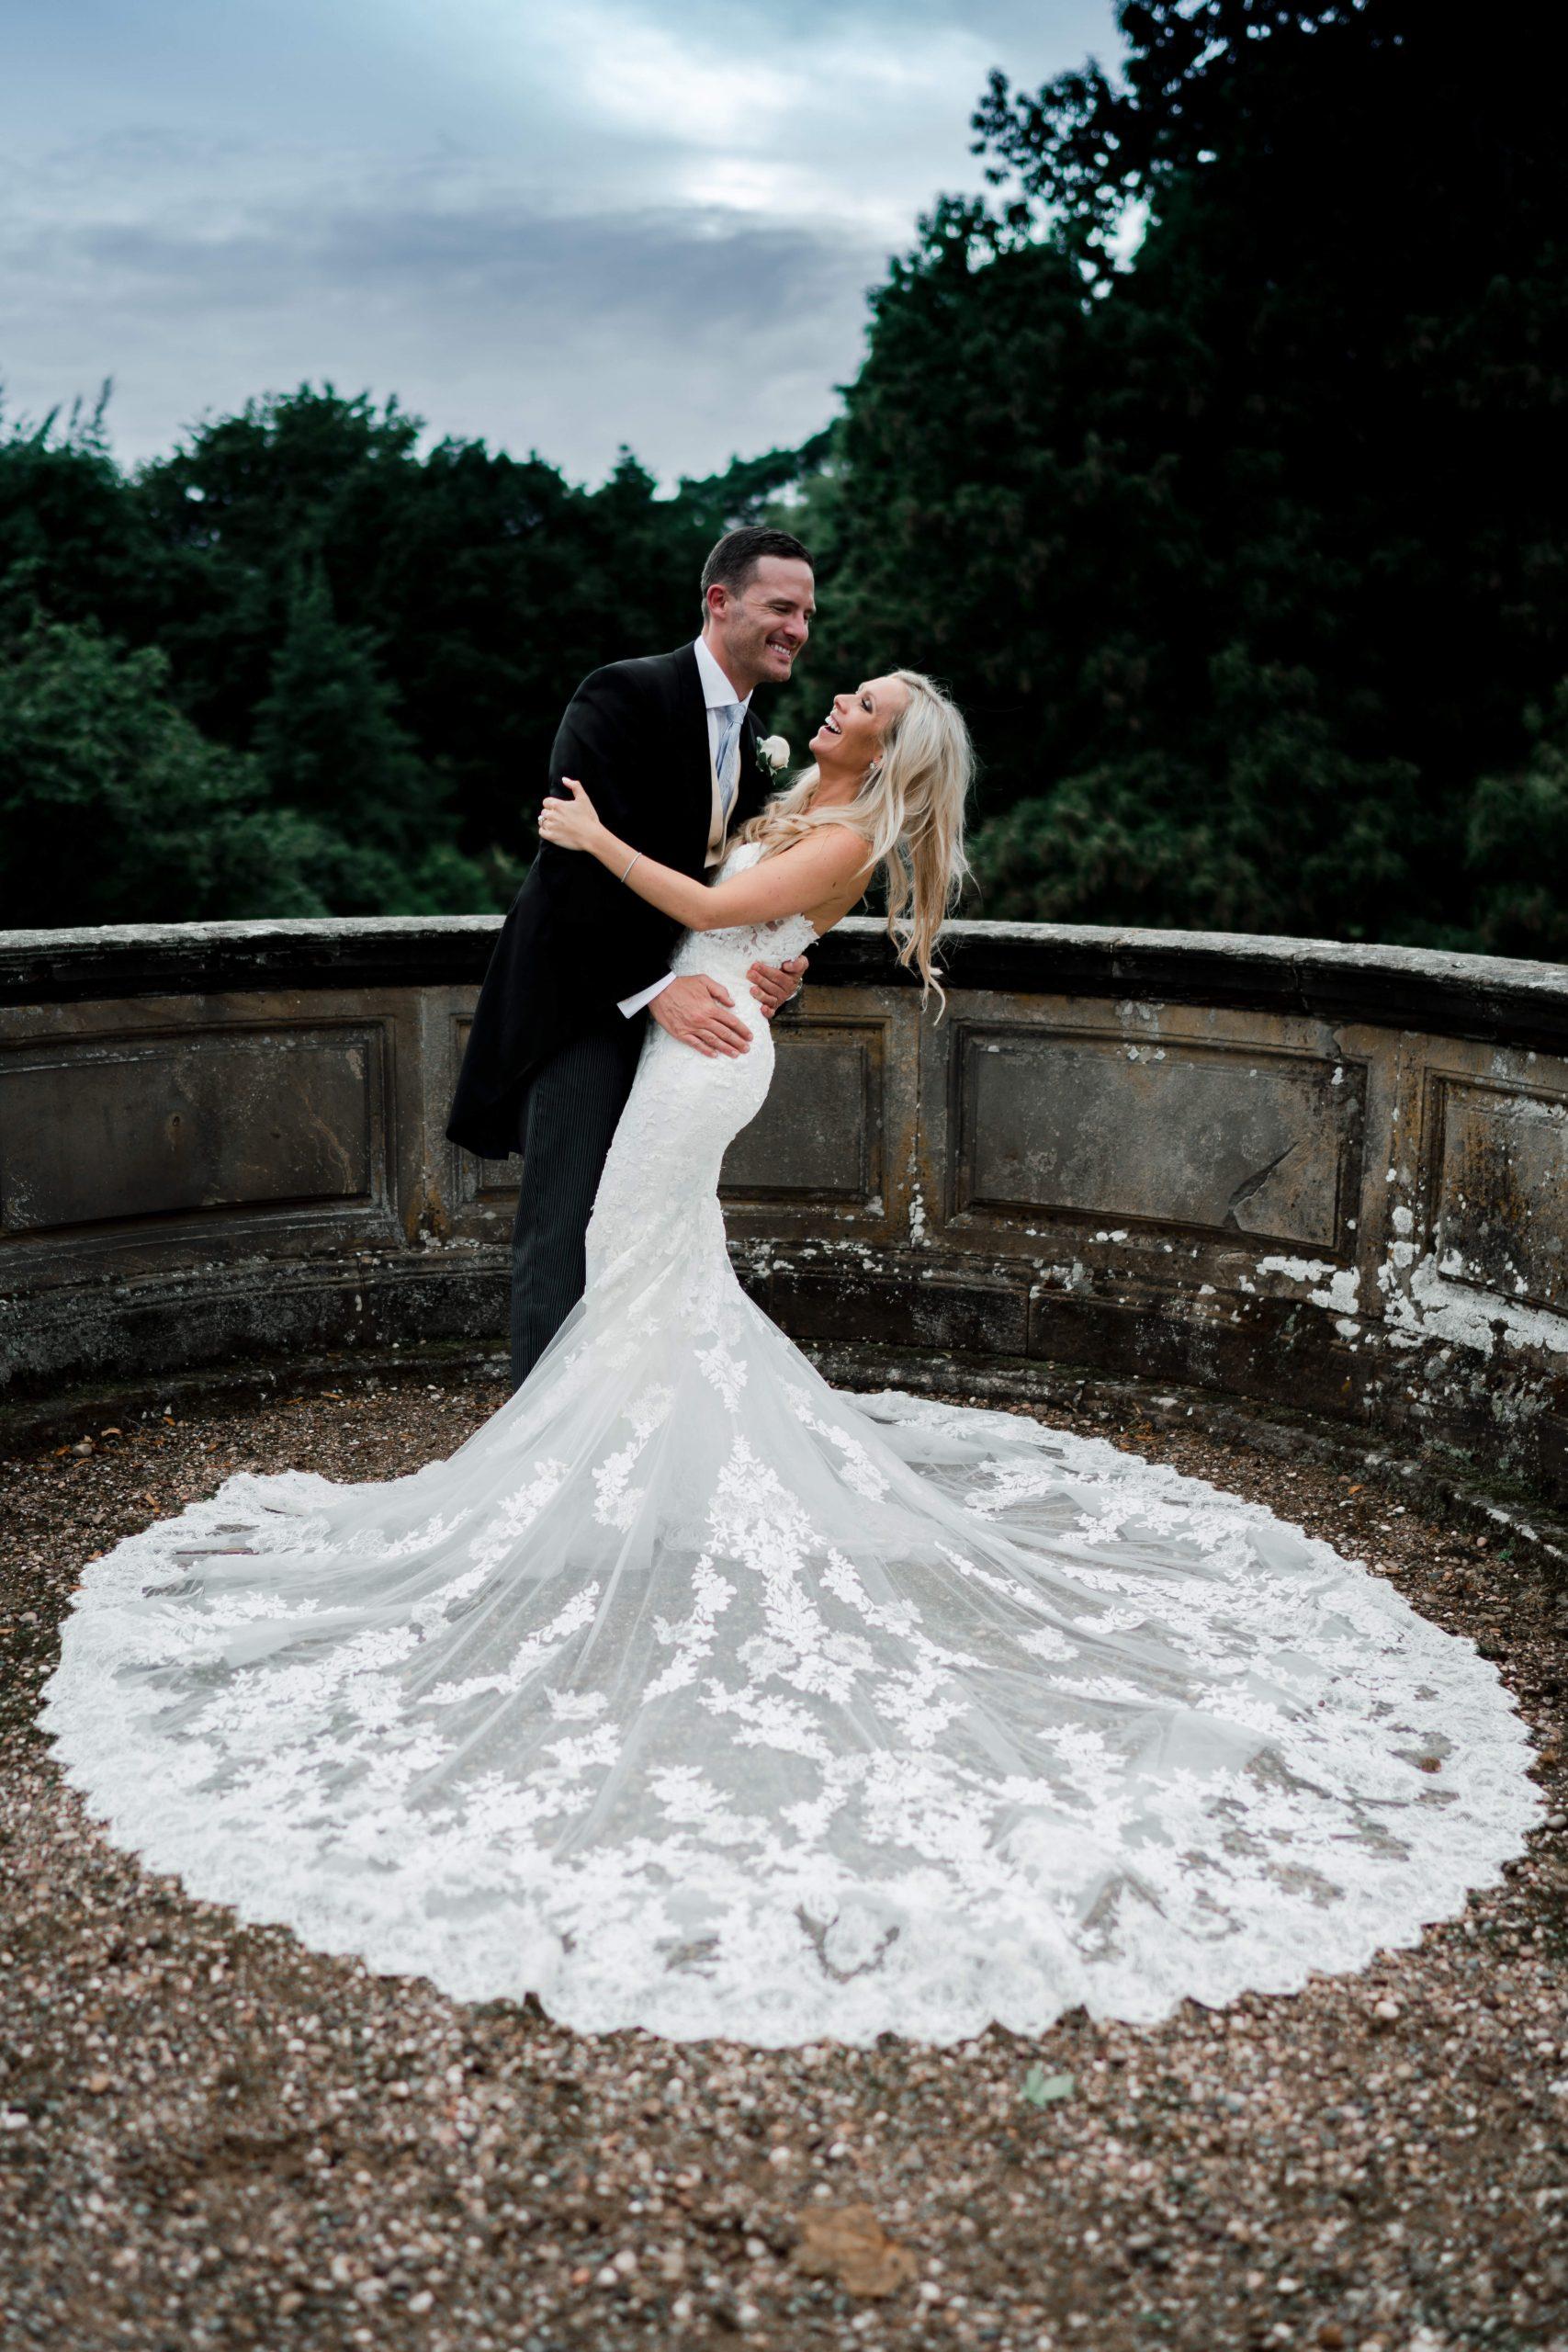 wedding-photographer-and-videographer-Weston-park-12